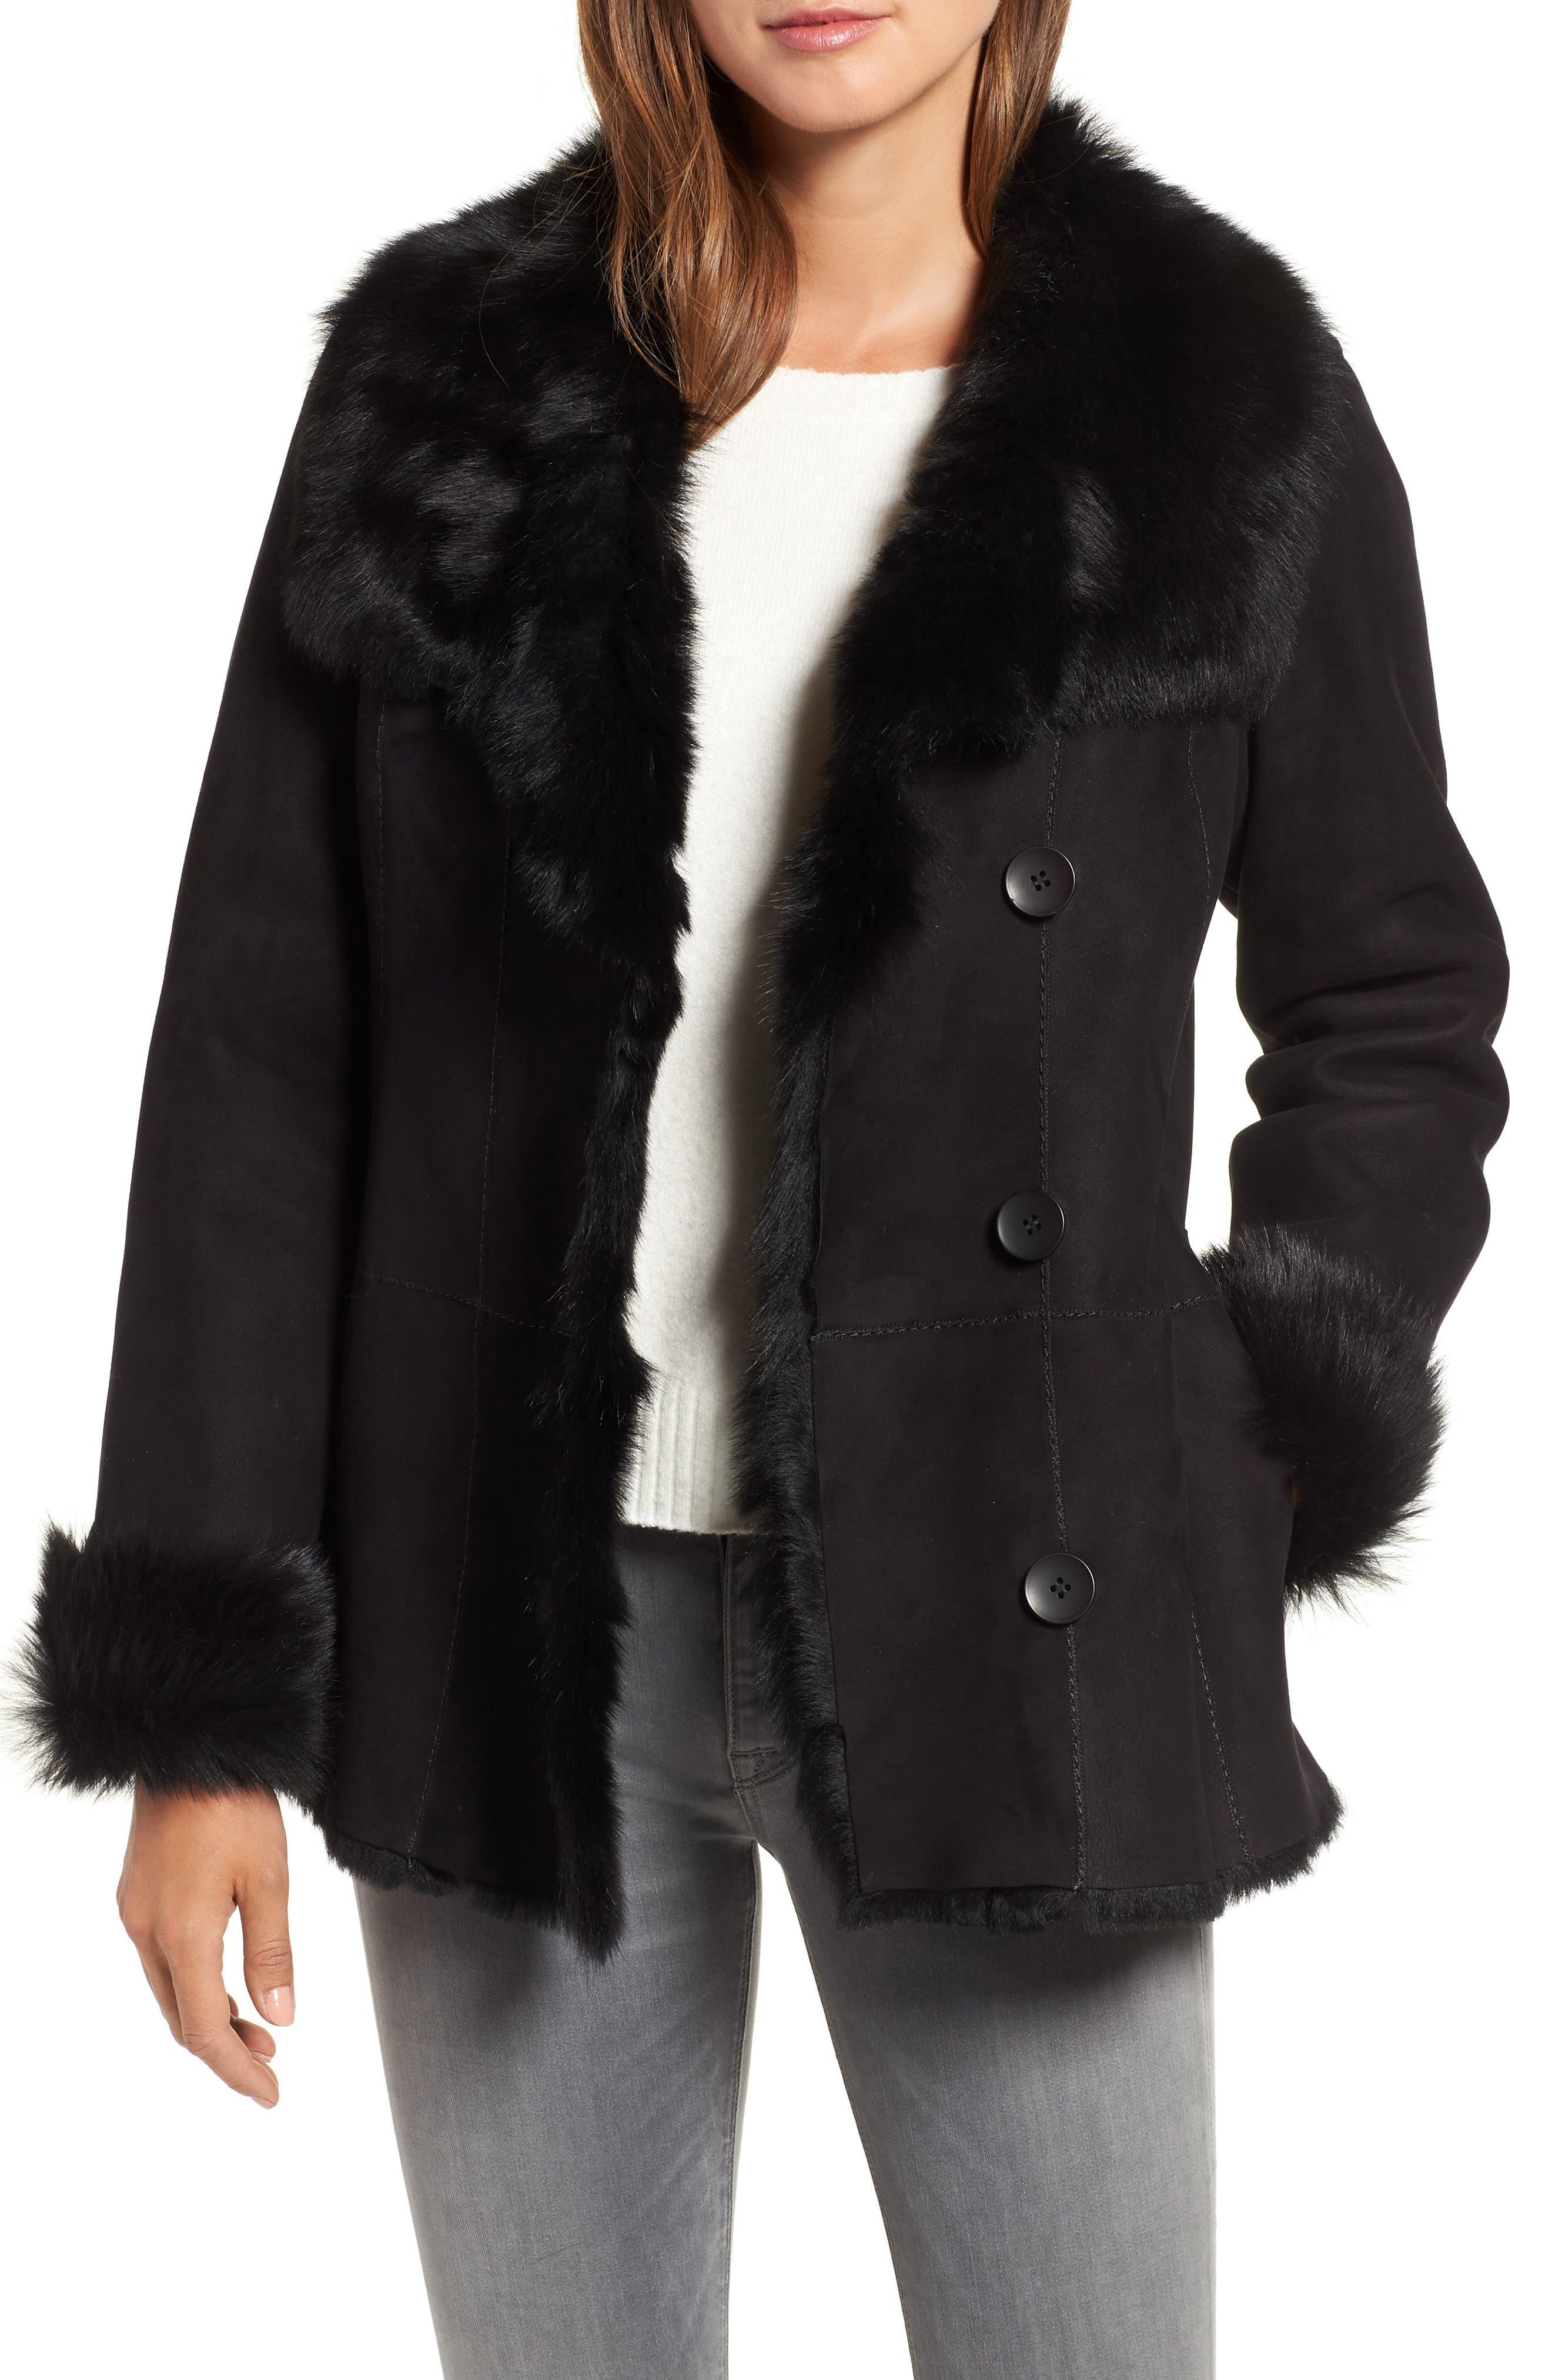 Hiso Reversible Genuine Toscana Shearling Jacket, Black